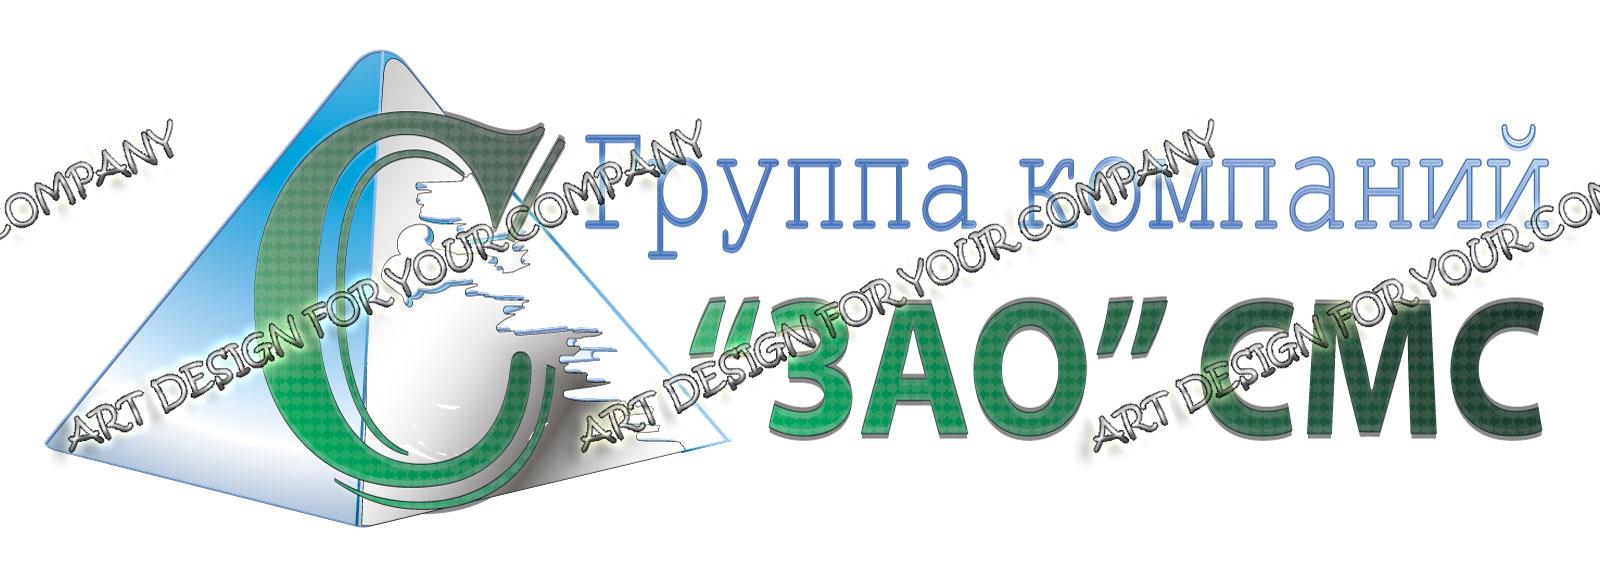 Дизайнер для разработки Логотипа для организации !СРОЧНО! фото f_3905a297edb93531.jpg